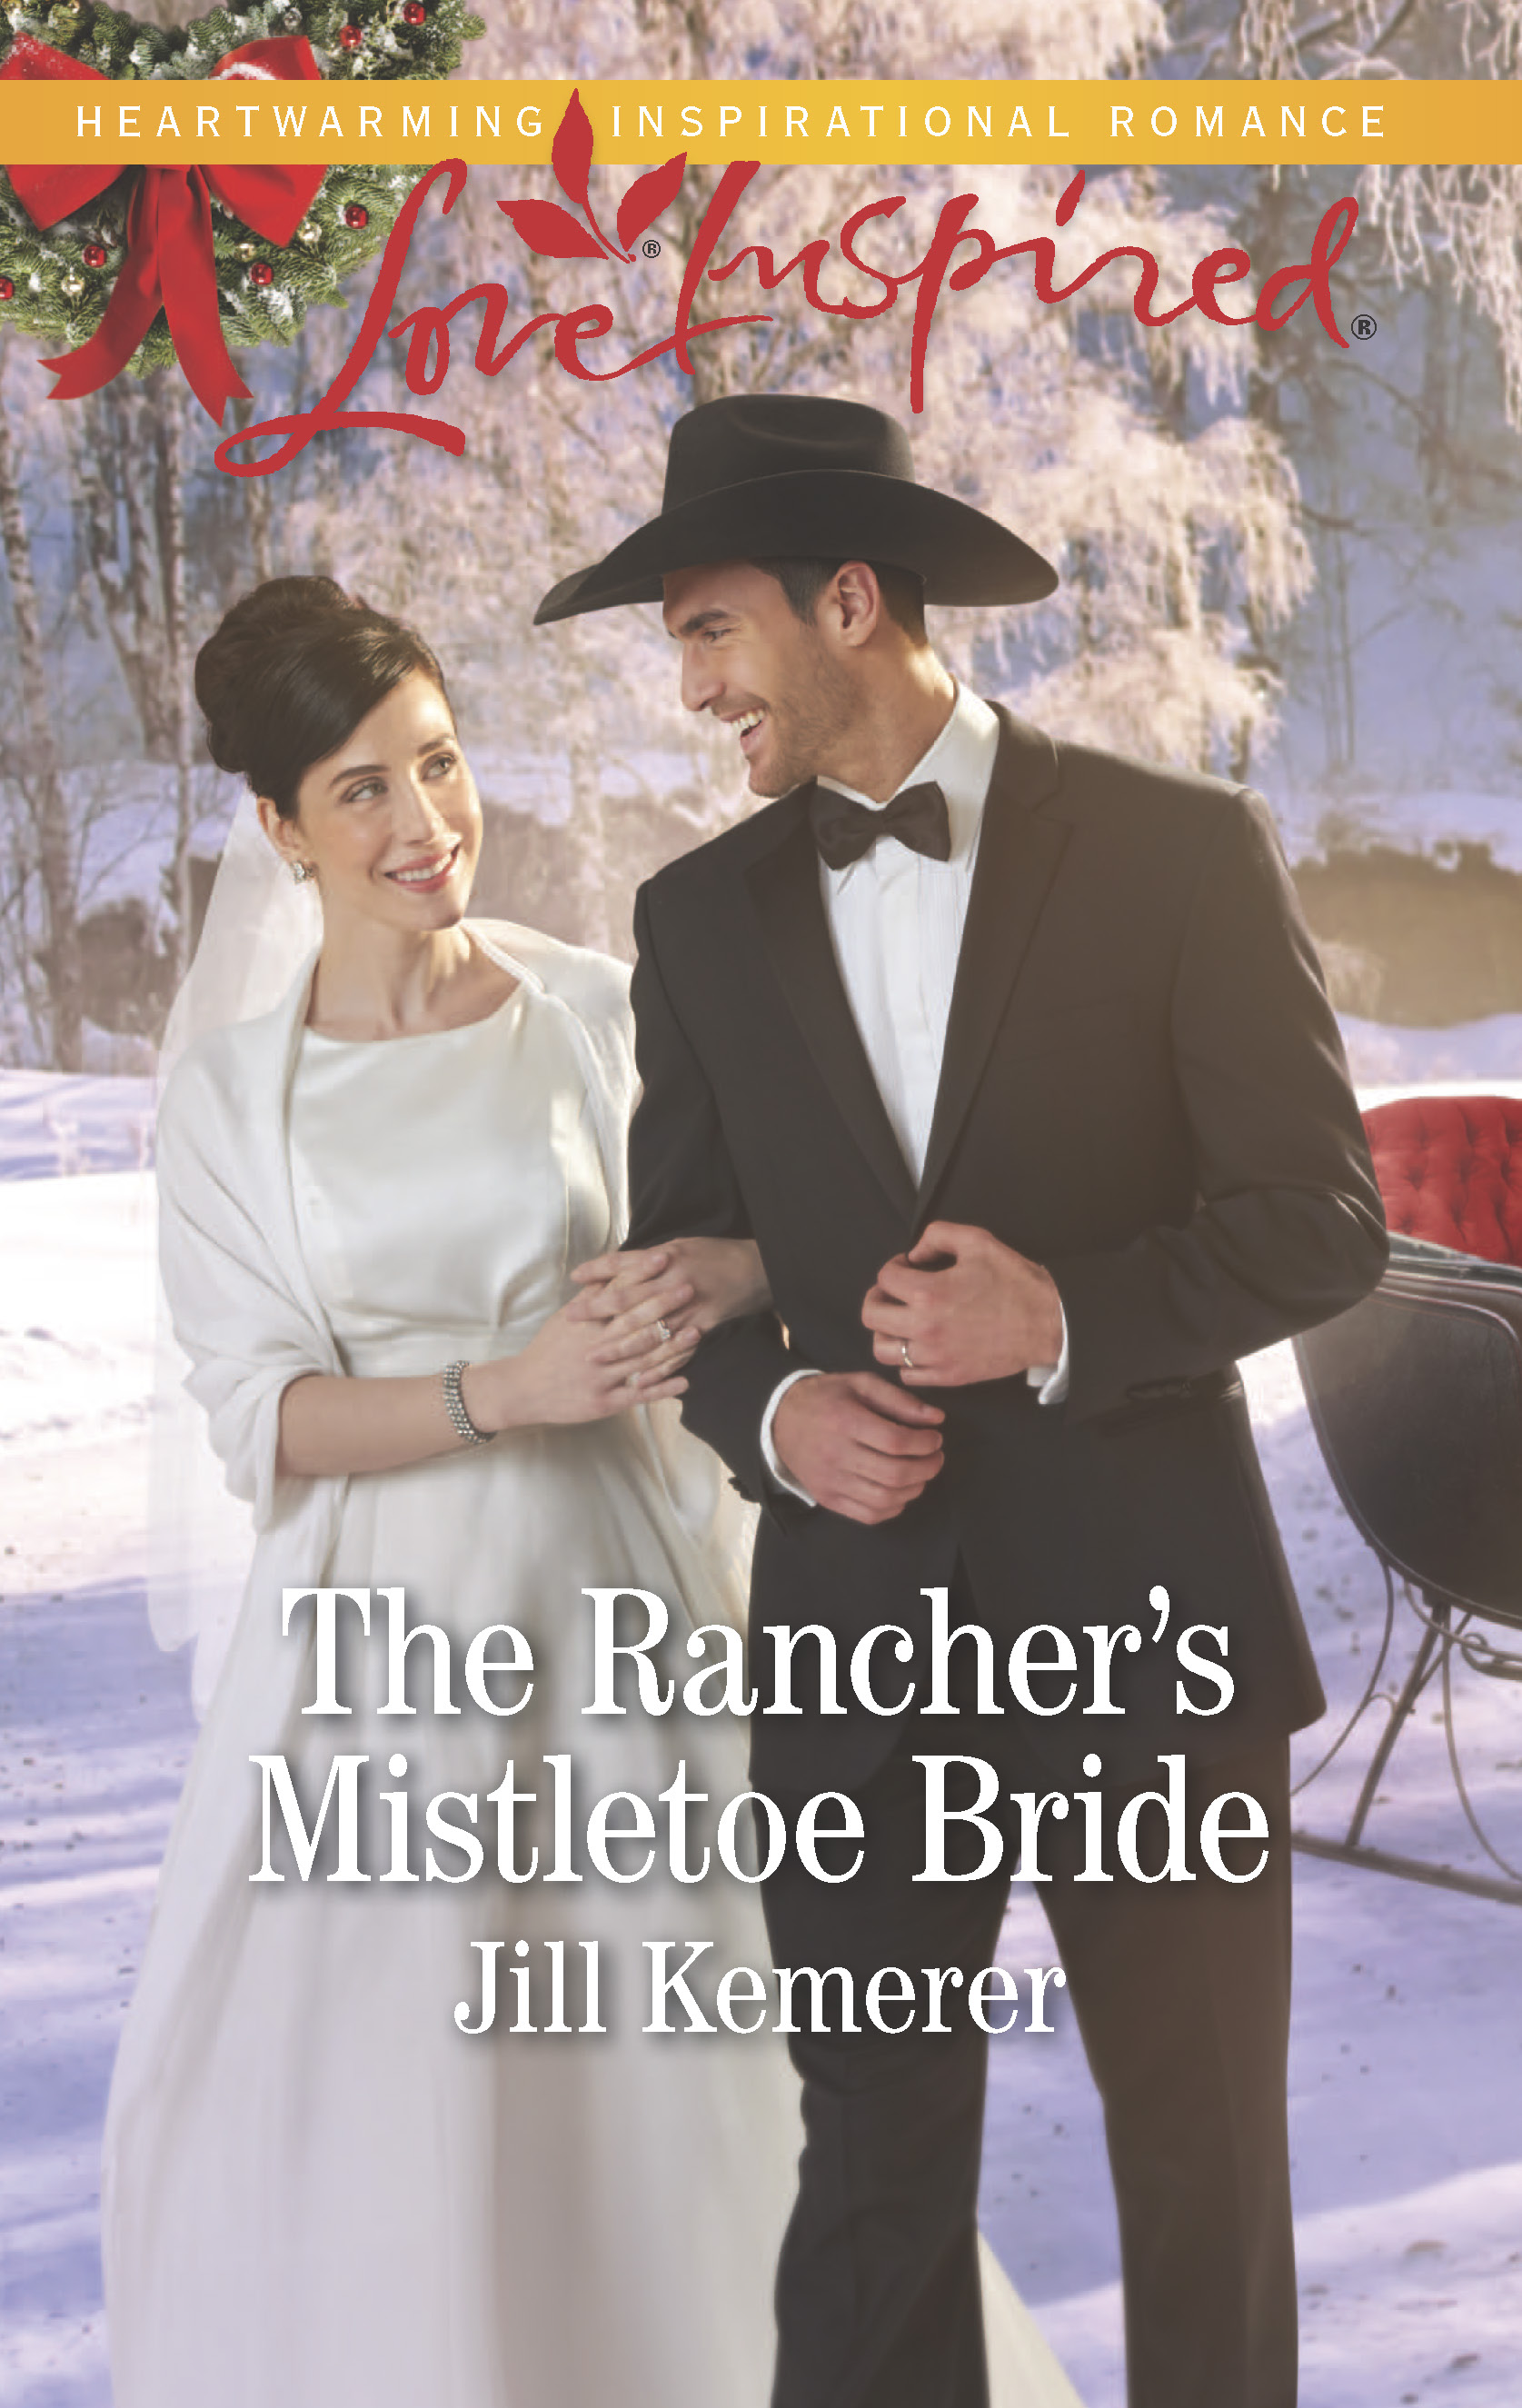 Paperback Release of The Rancher's Mistletoe Bride!